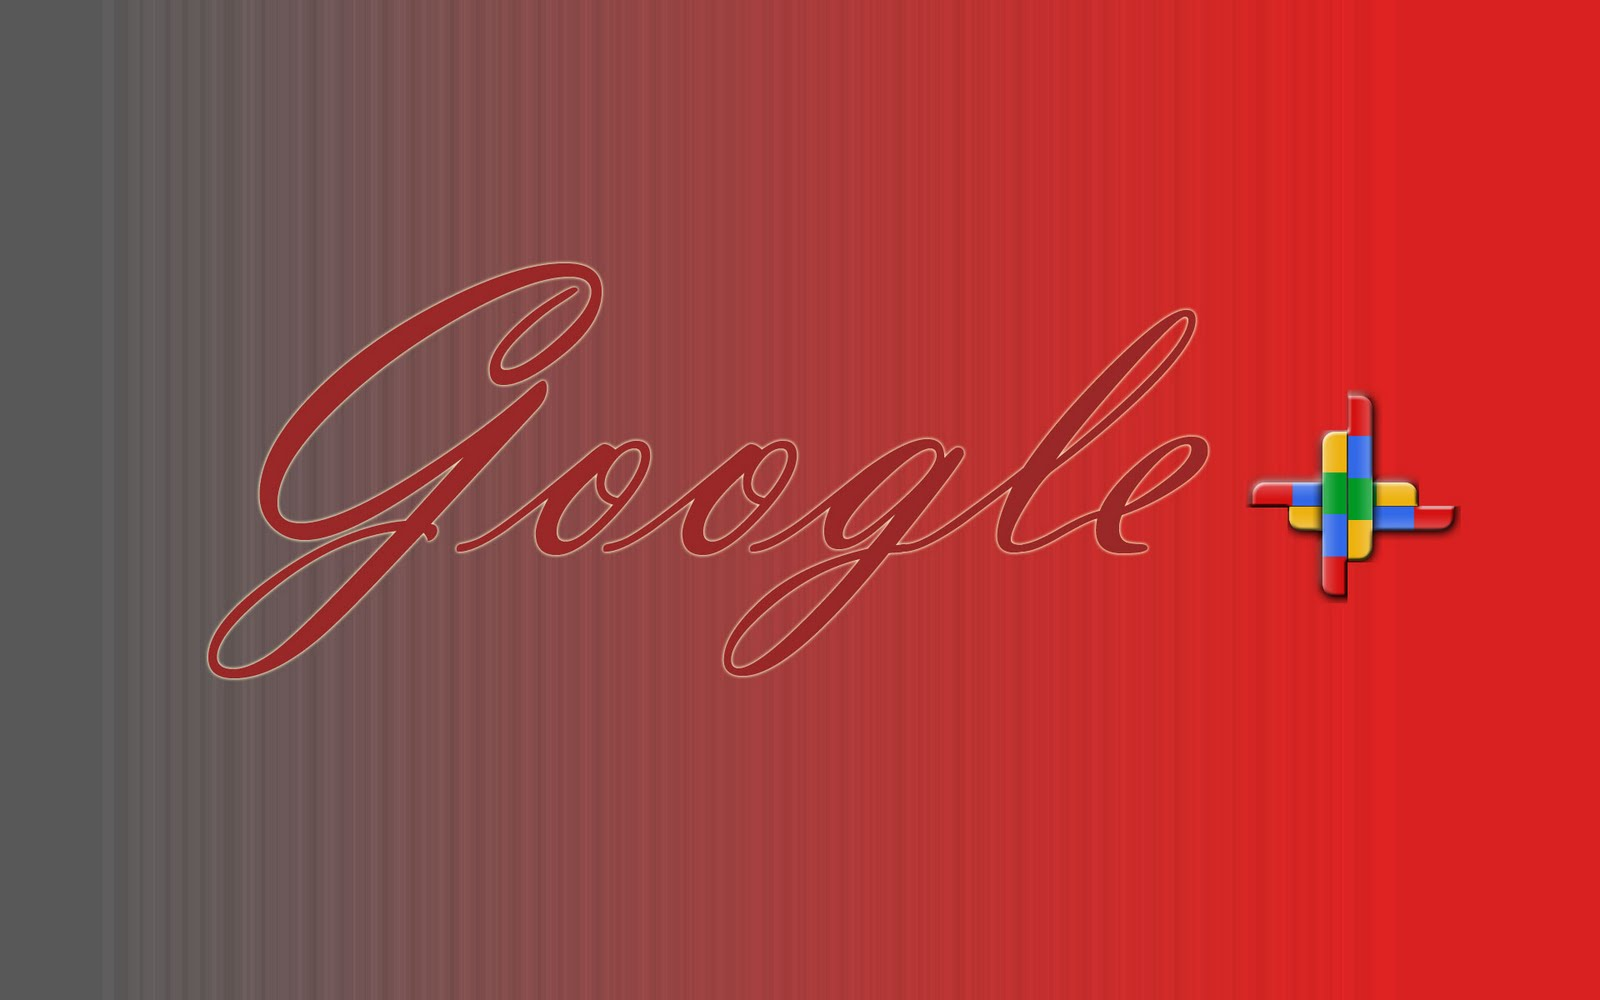 Download 12 Free Google Plus Wallpapers | Google Plus Info